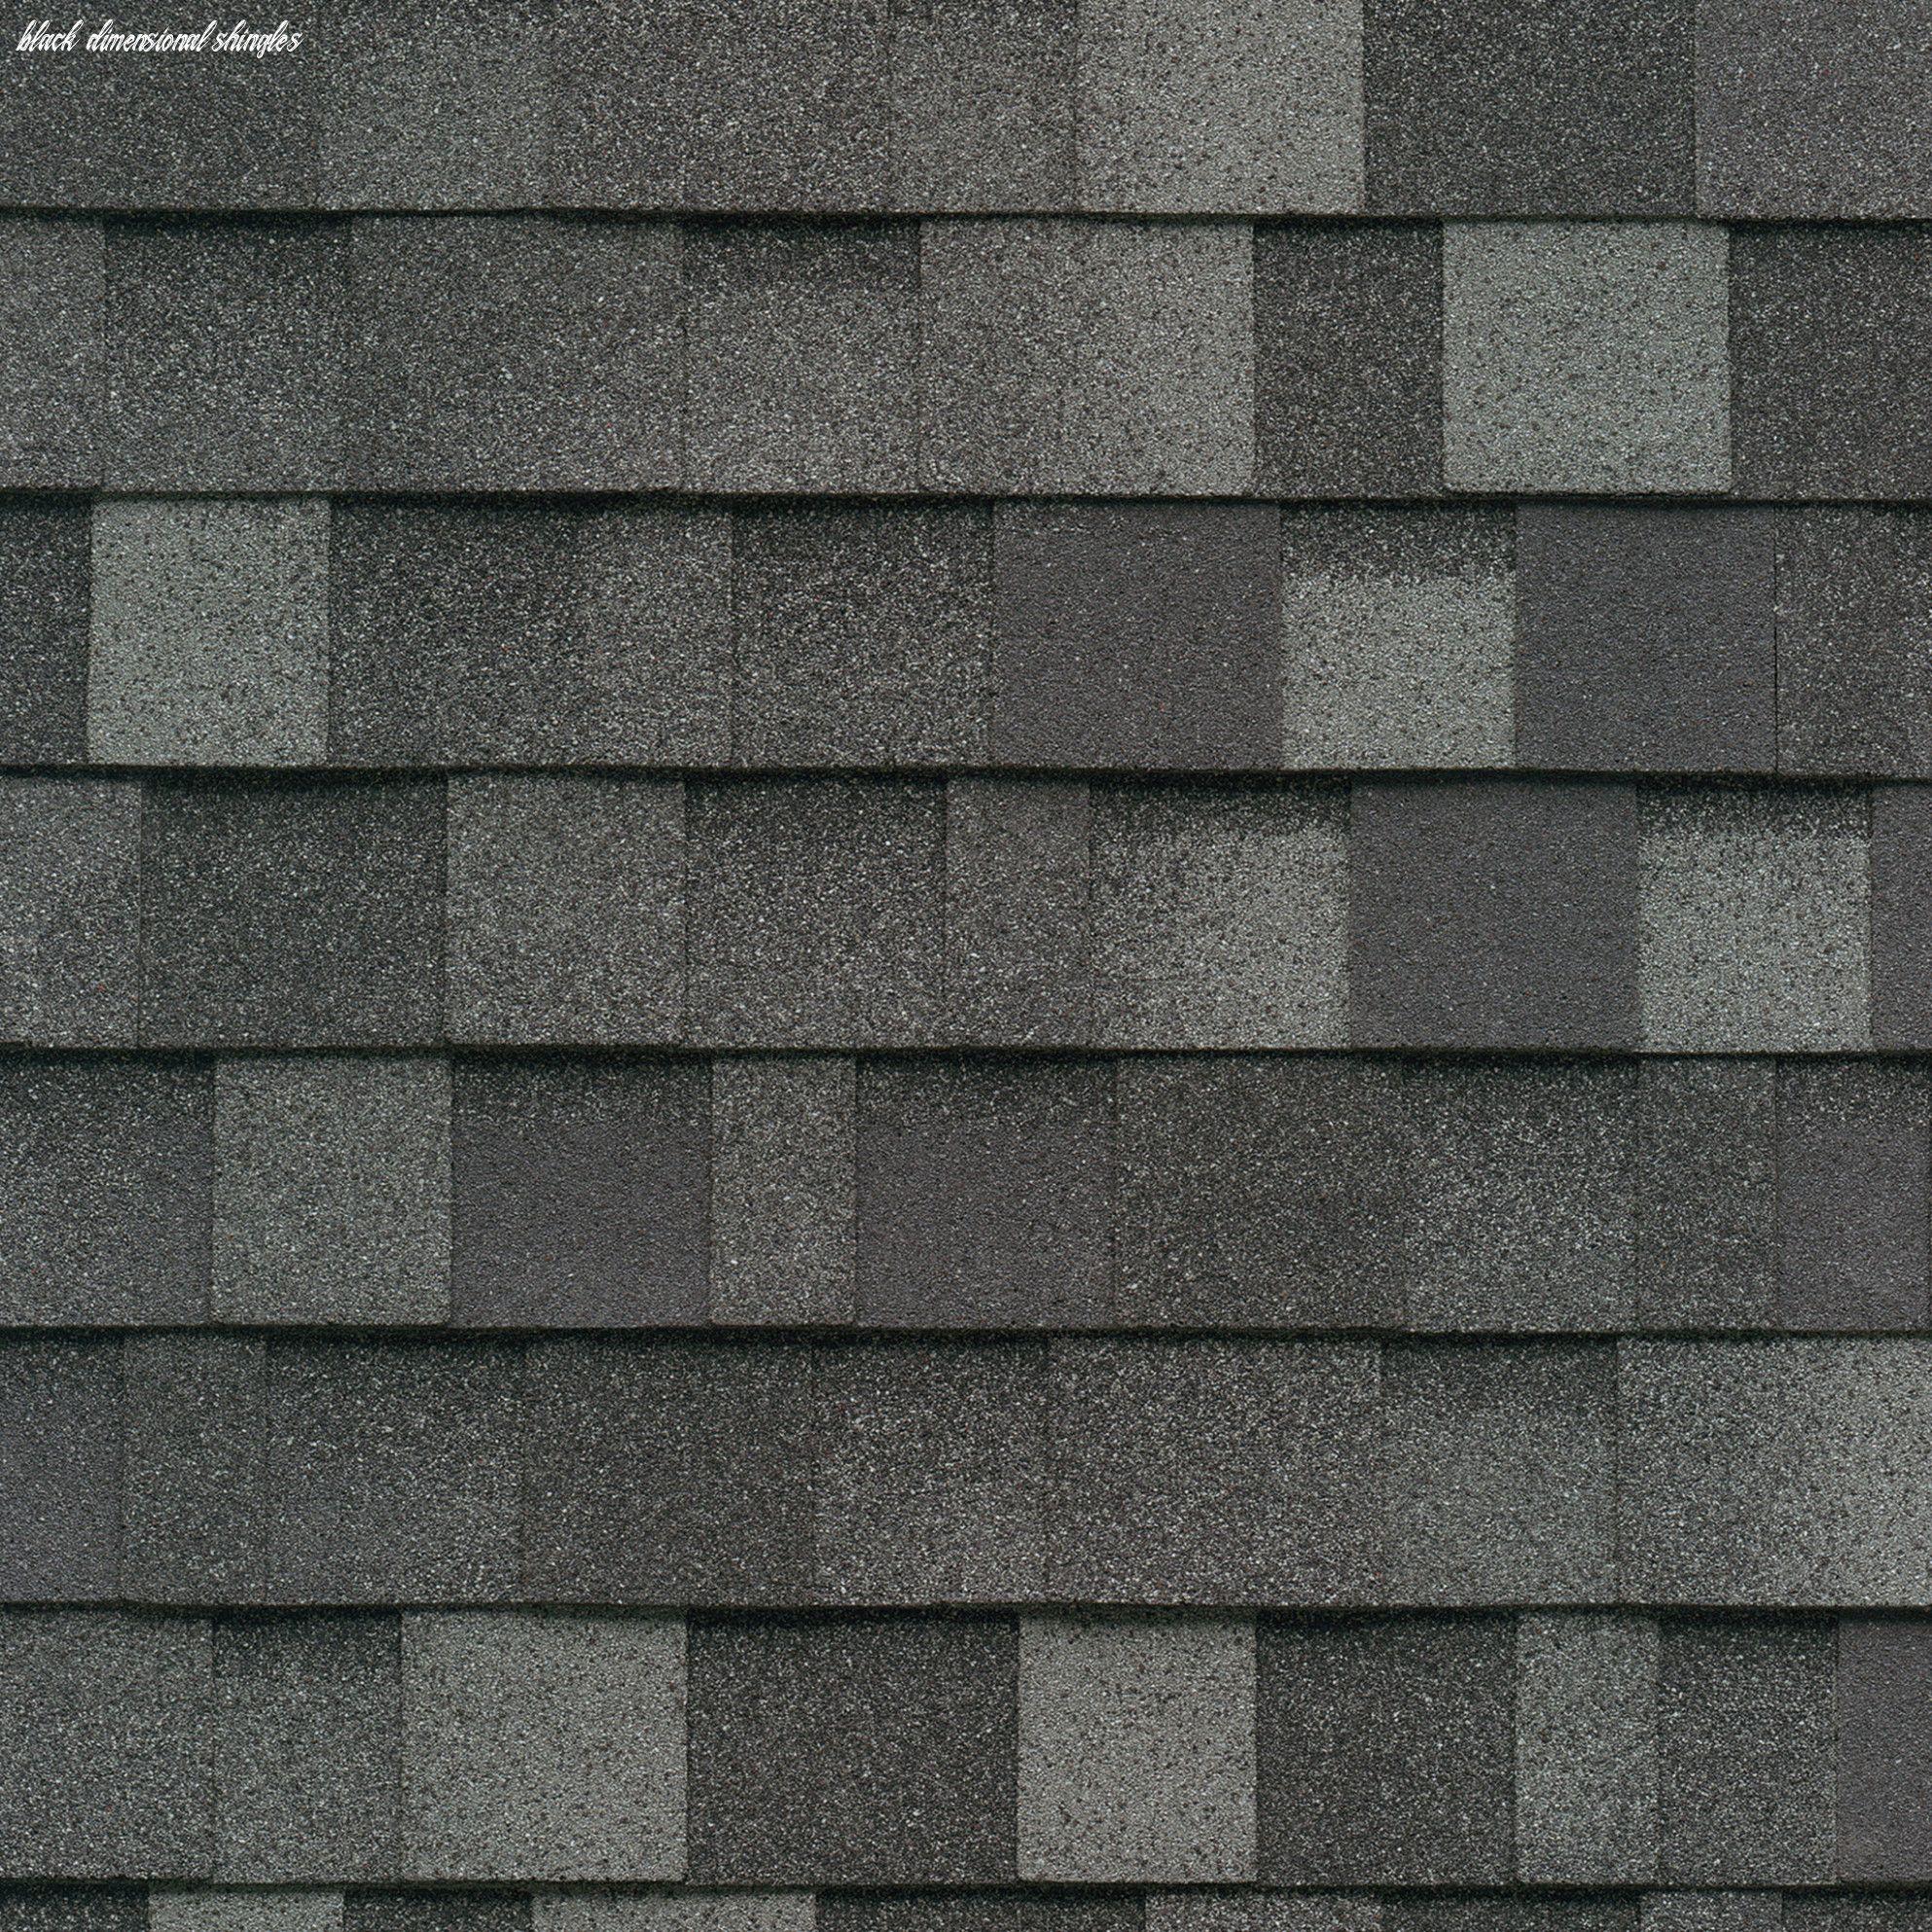 13 Black Dimensional Shingles In 2020 Roof Shingle Colors Roof Shingles Shingle Colors